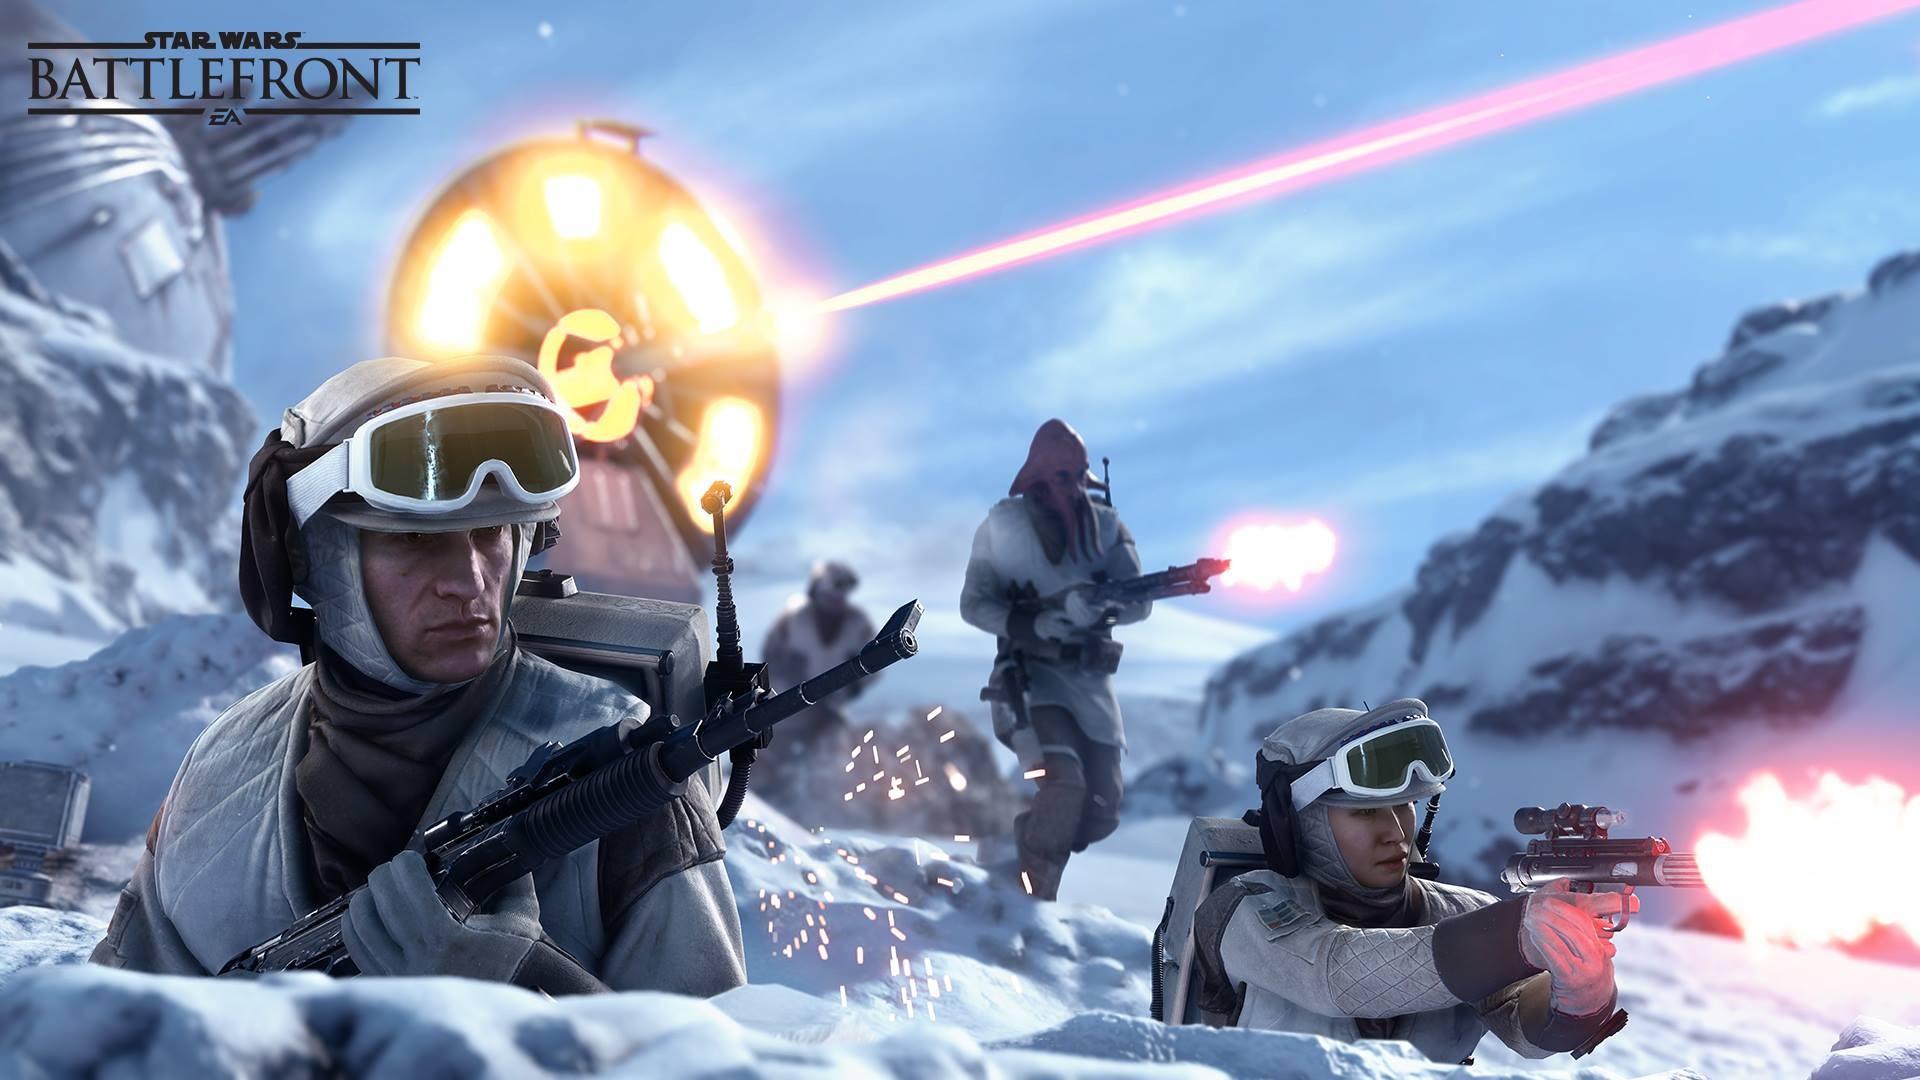 Wallpaper Star Wars Rebel Alliance Battle Of Hoth Star Wars